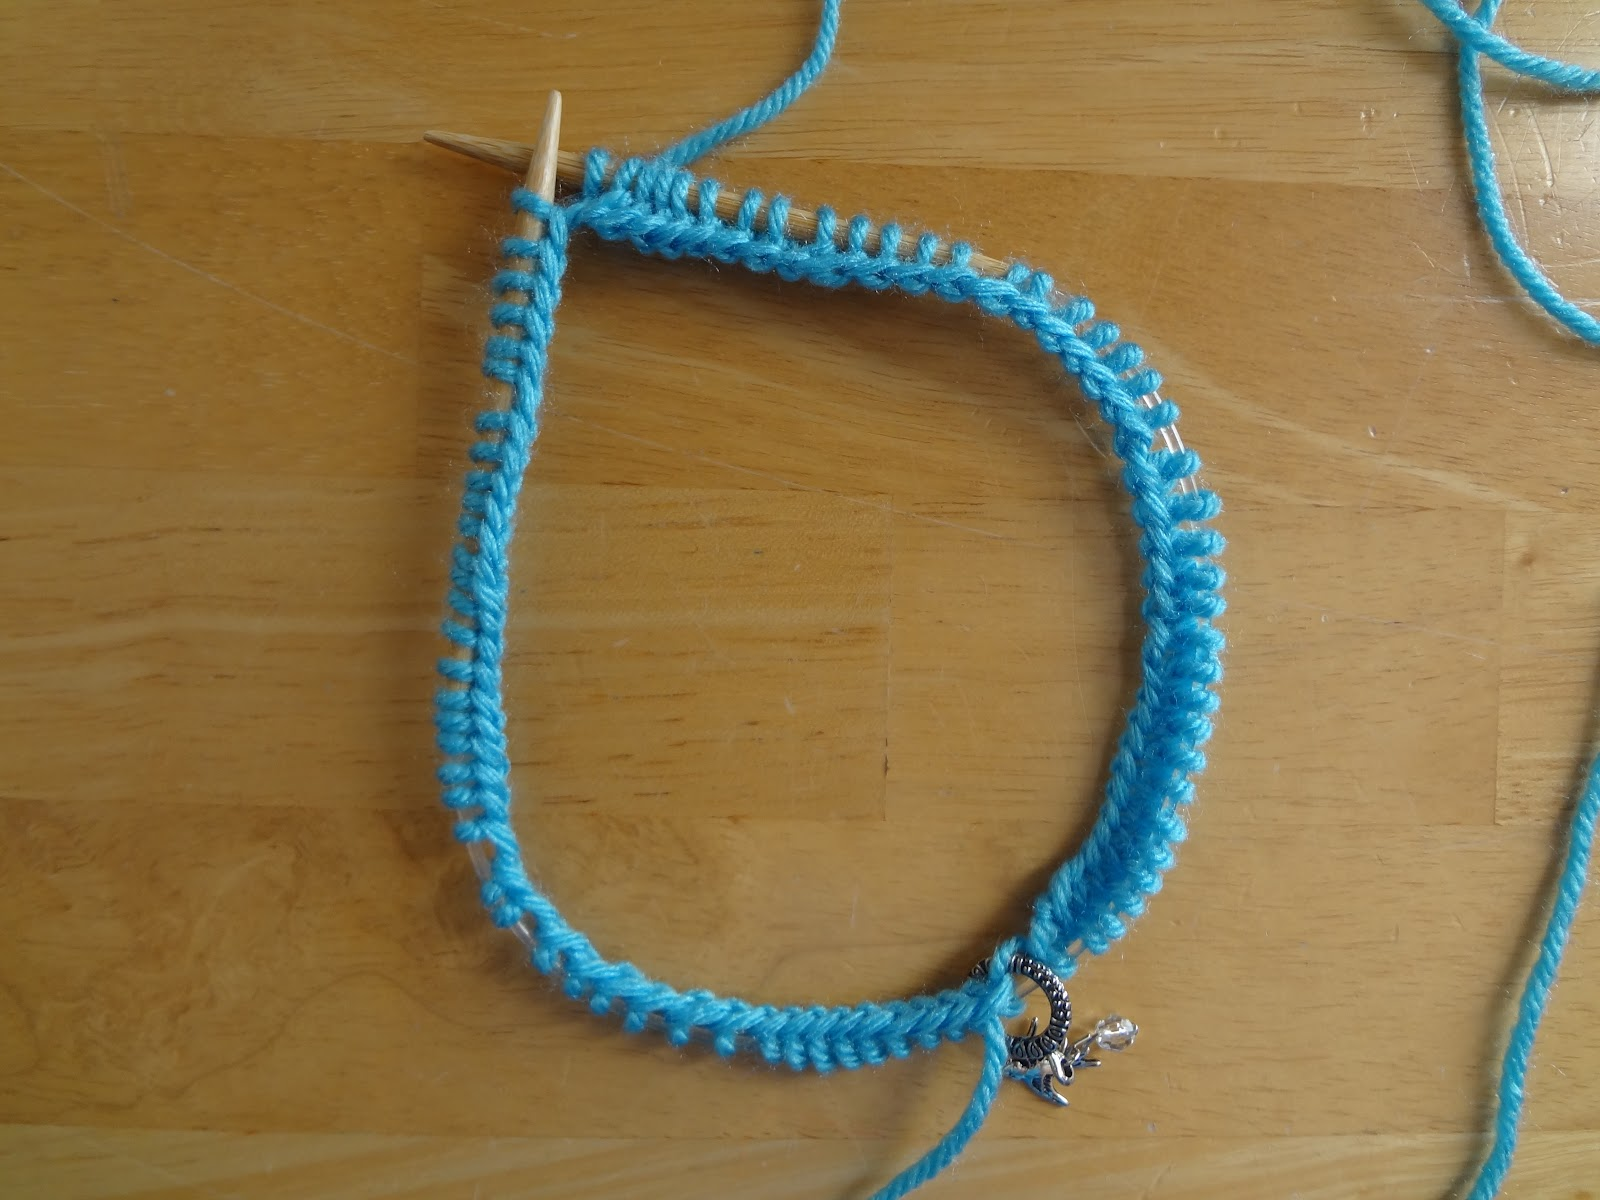 Knitting On The Round Circular Needles : Fiber flux how to knit in the round with circular needles